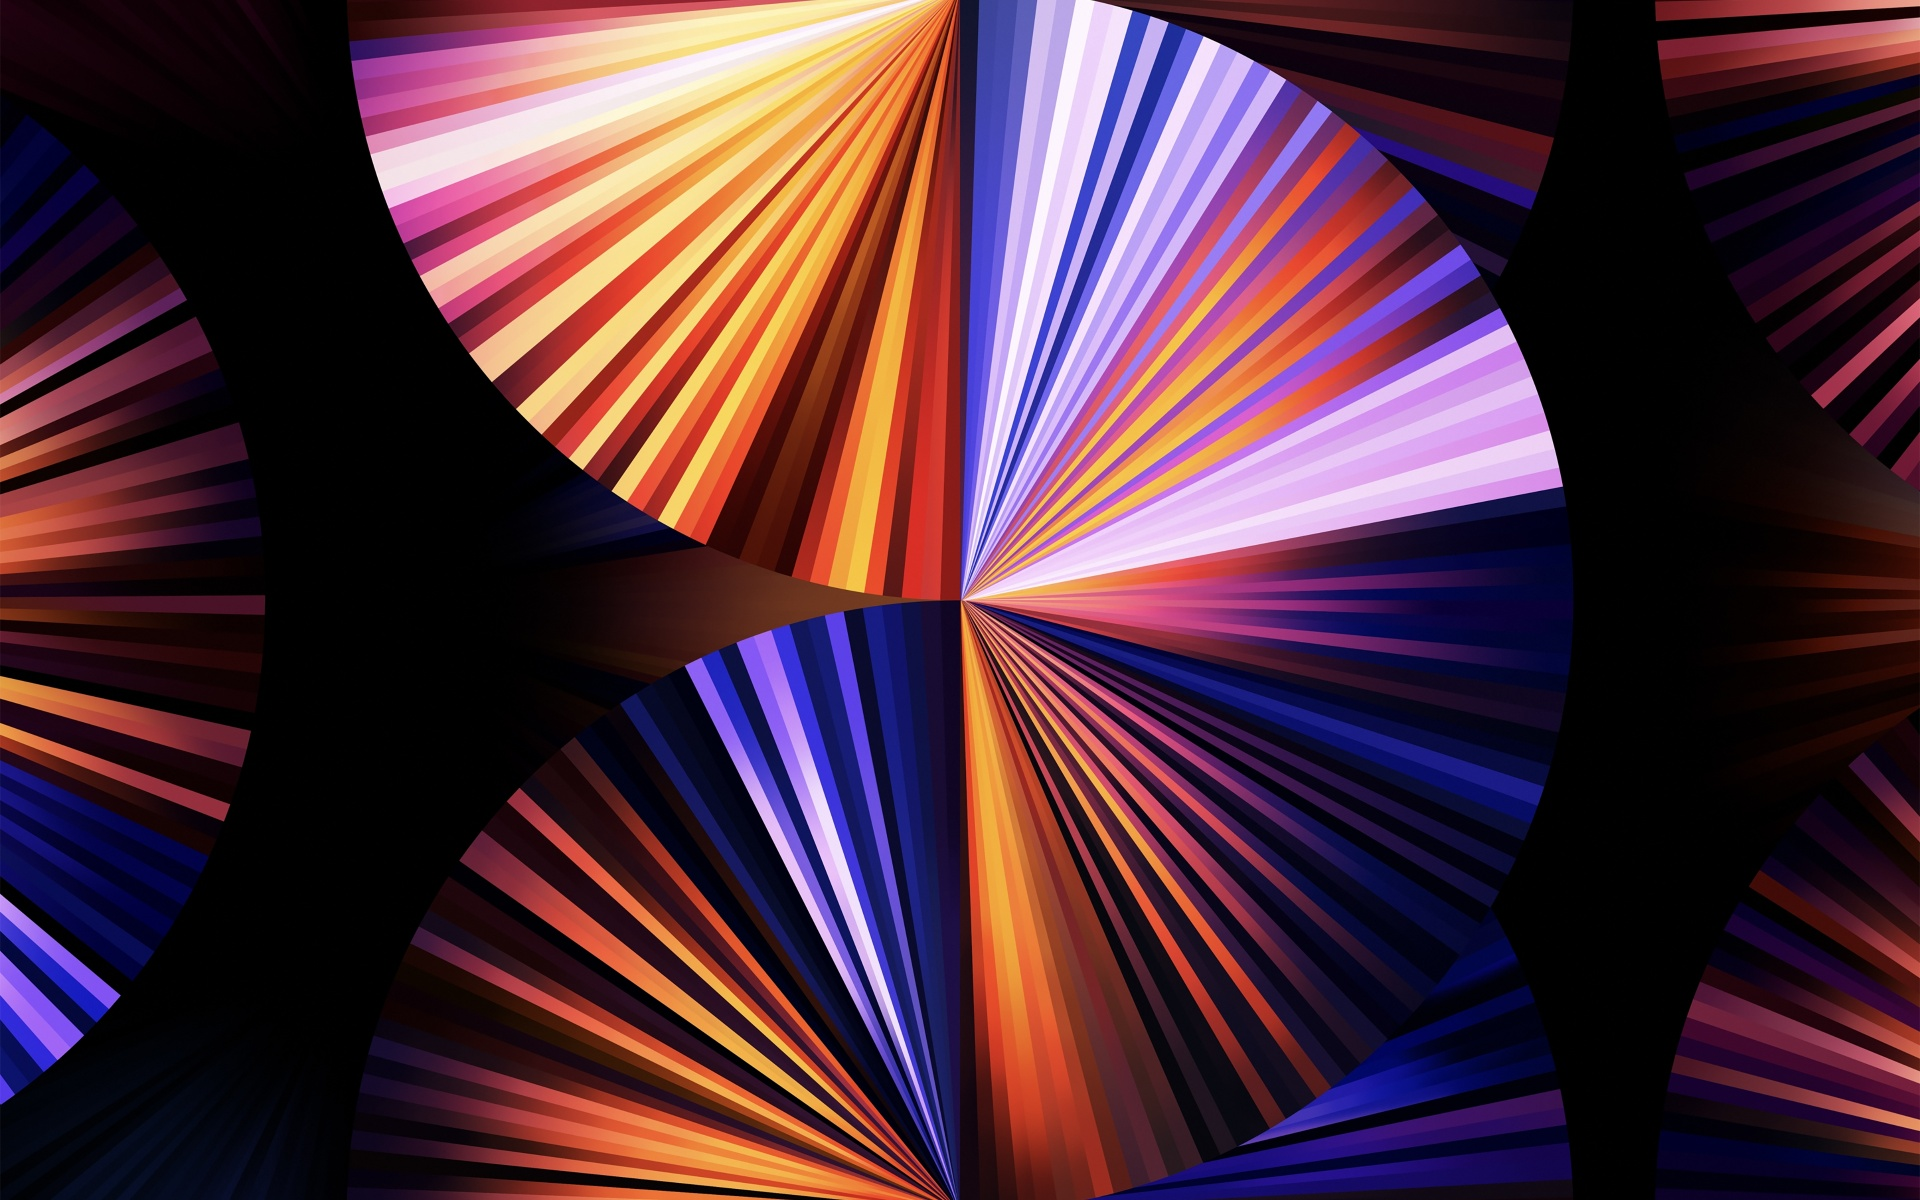 iPad Pro 2021 Wallpaper 4K, Apple Event 2021, Purple ...